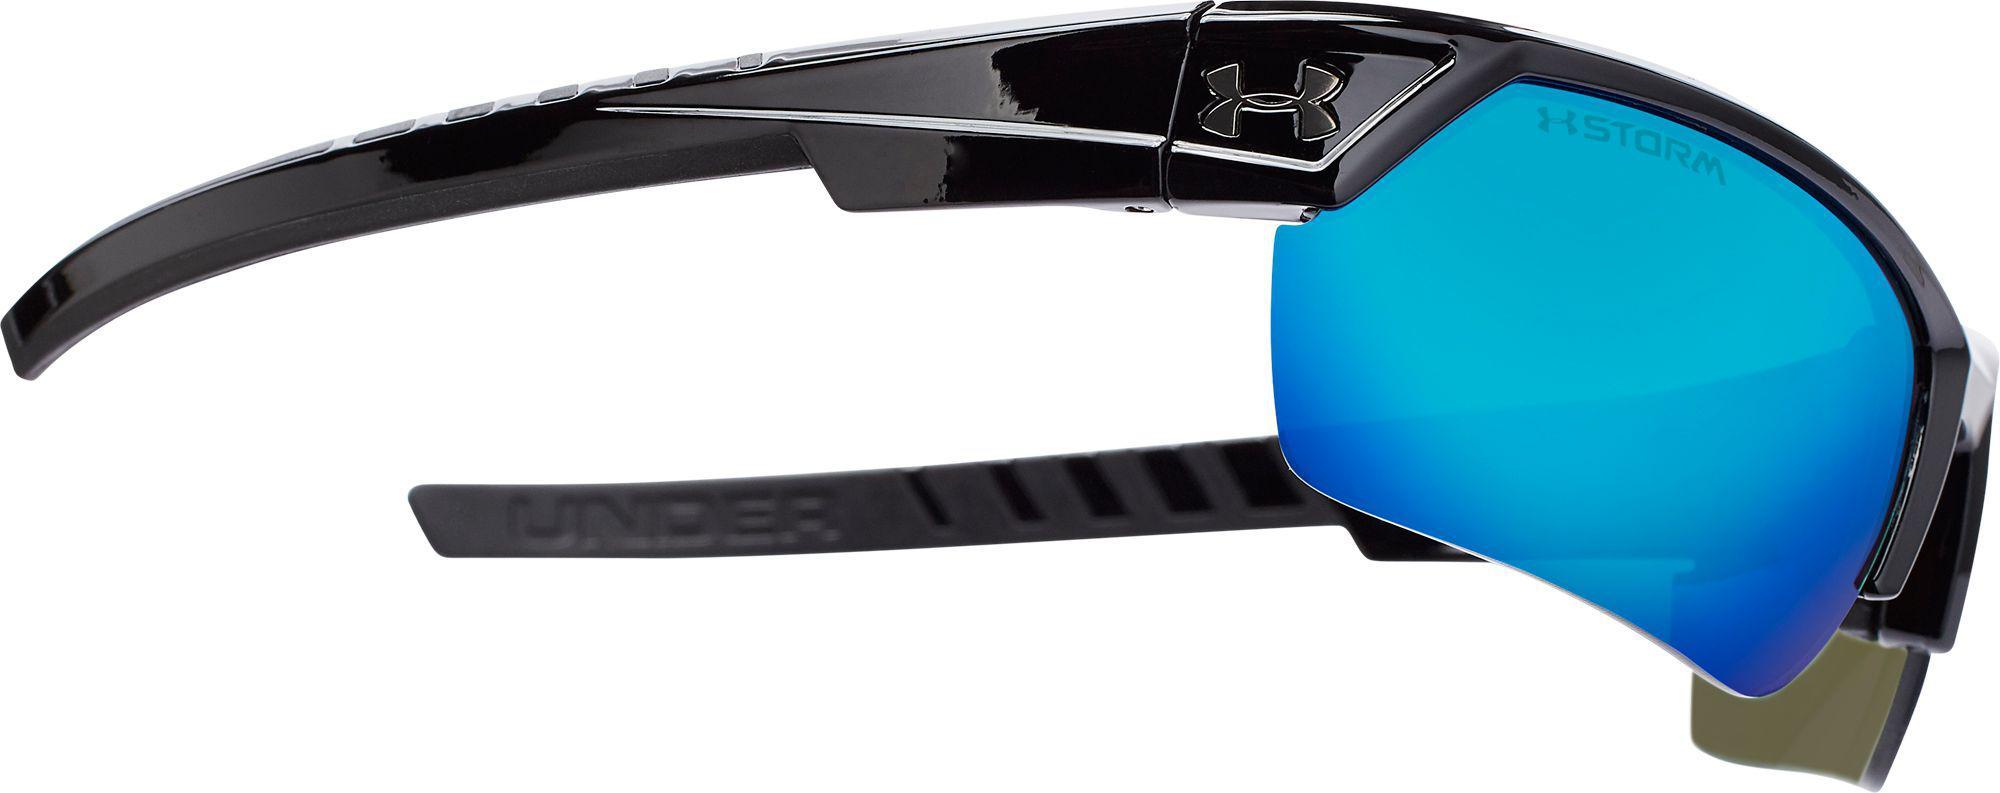 9ba9158fc0 Under Armour - Black Igniter 2.0 Storm Polarized Sunglasses for Men - Lyst